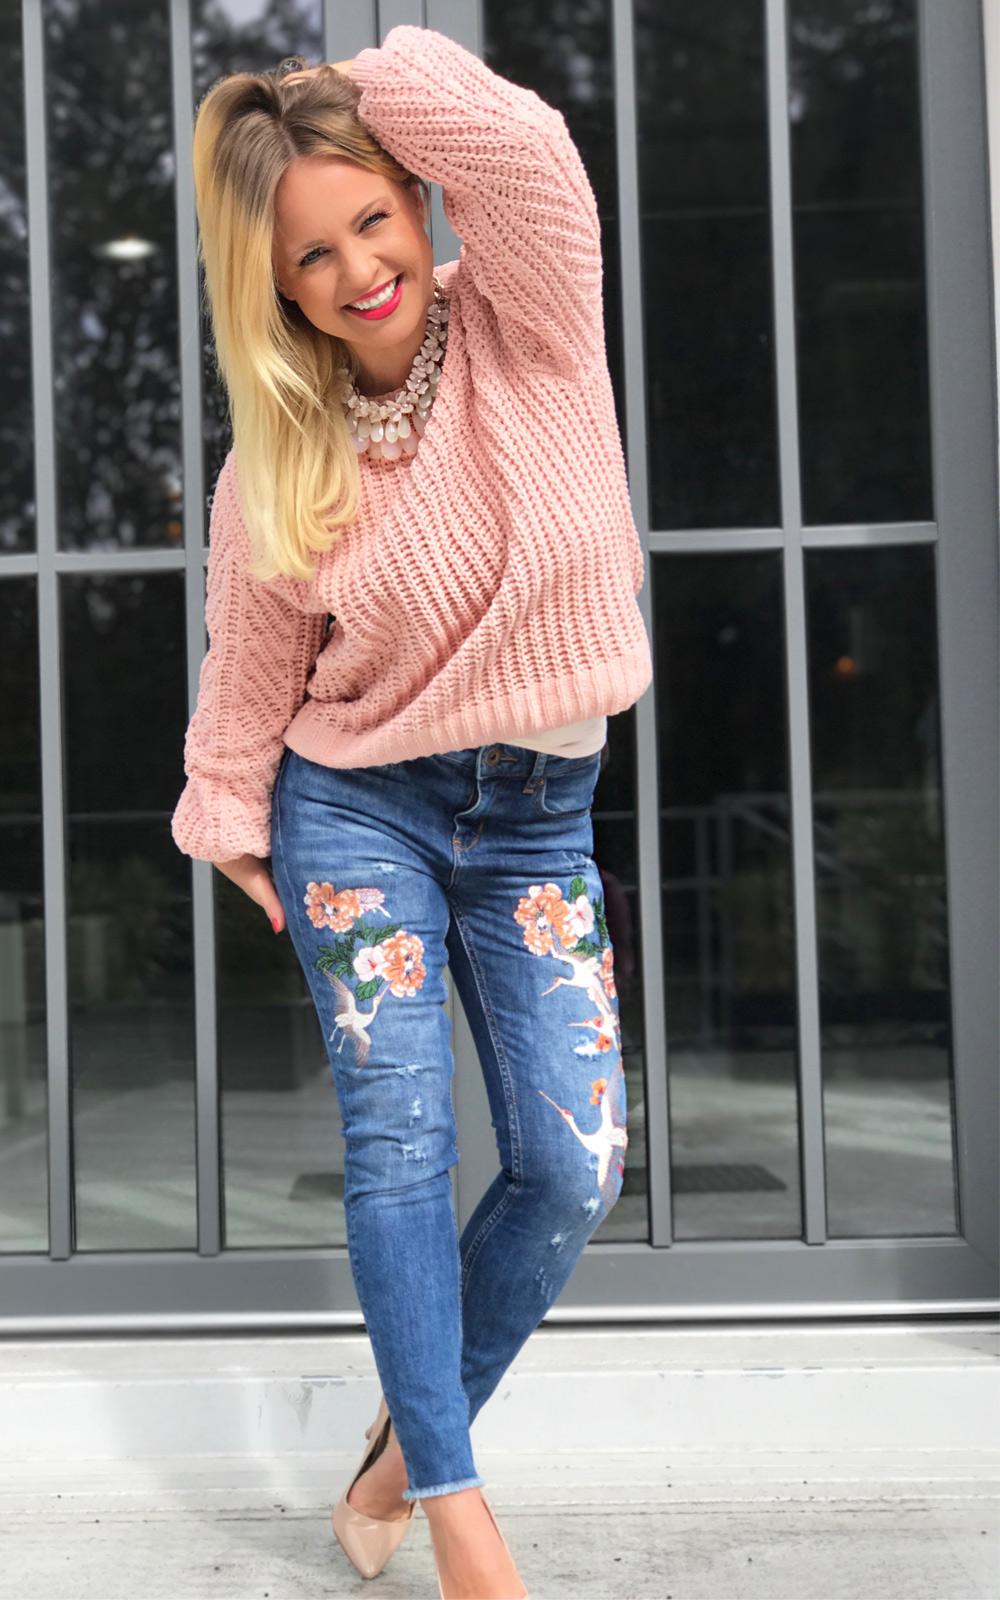 julia_pulli-pullover-jeans-heels_4